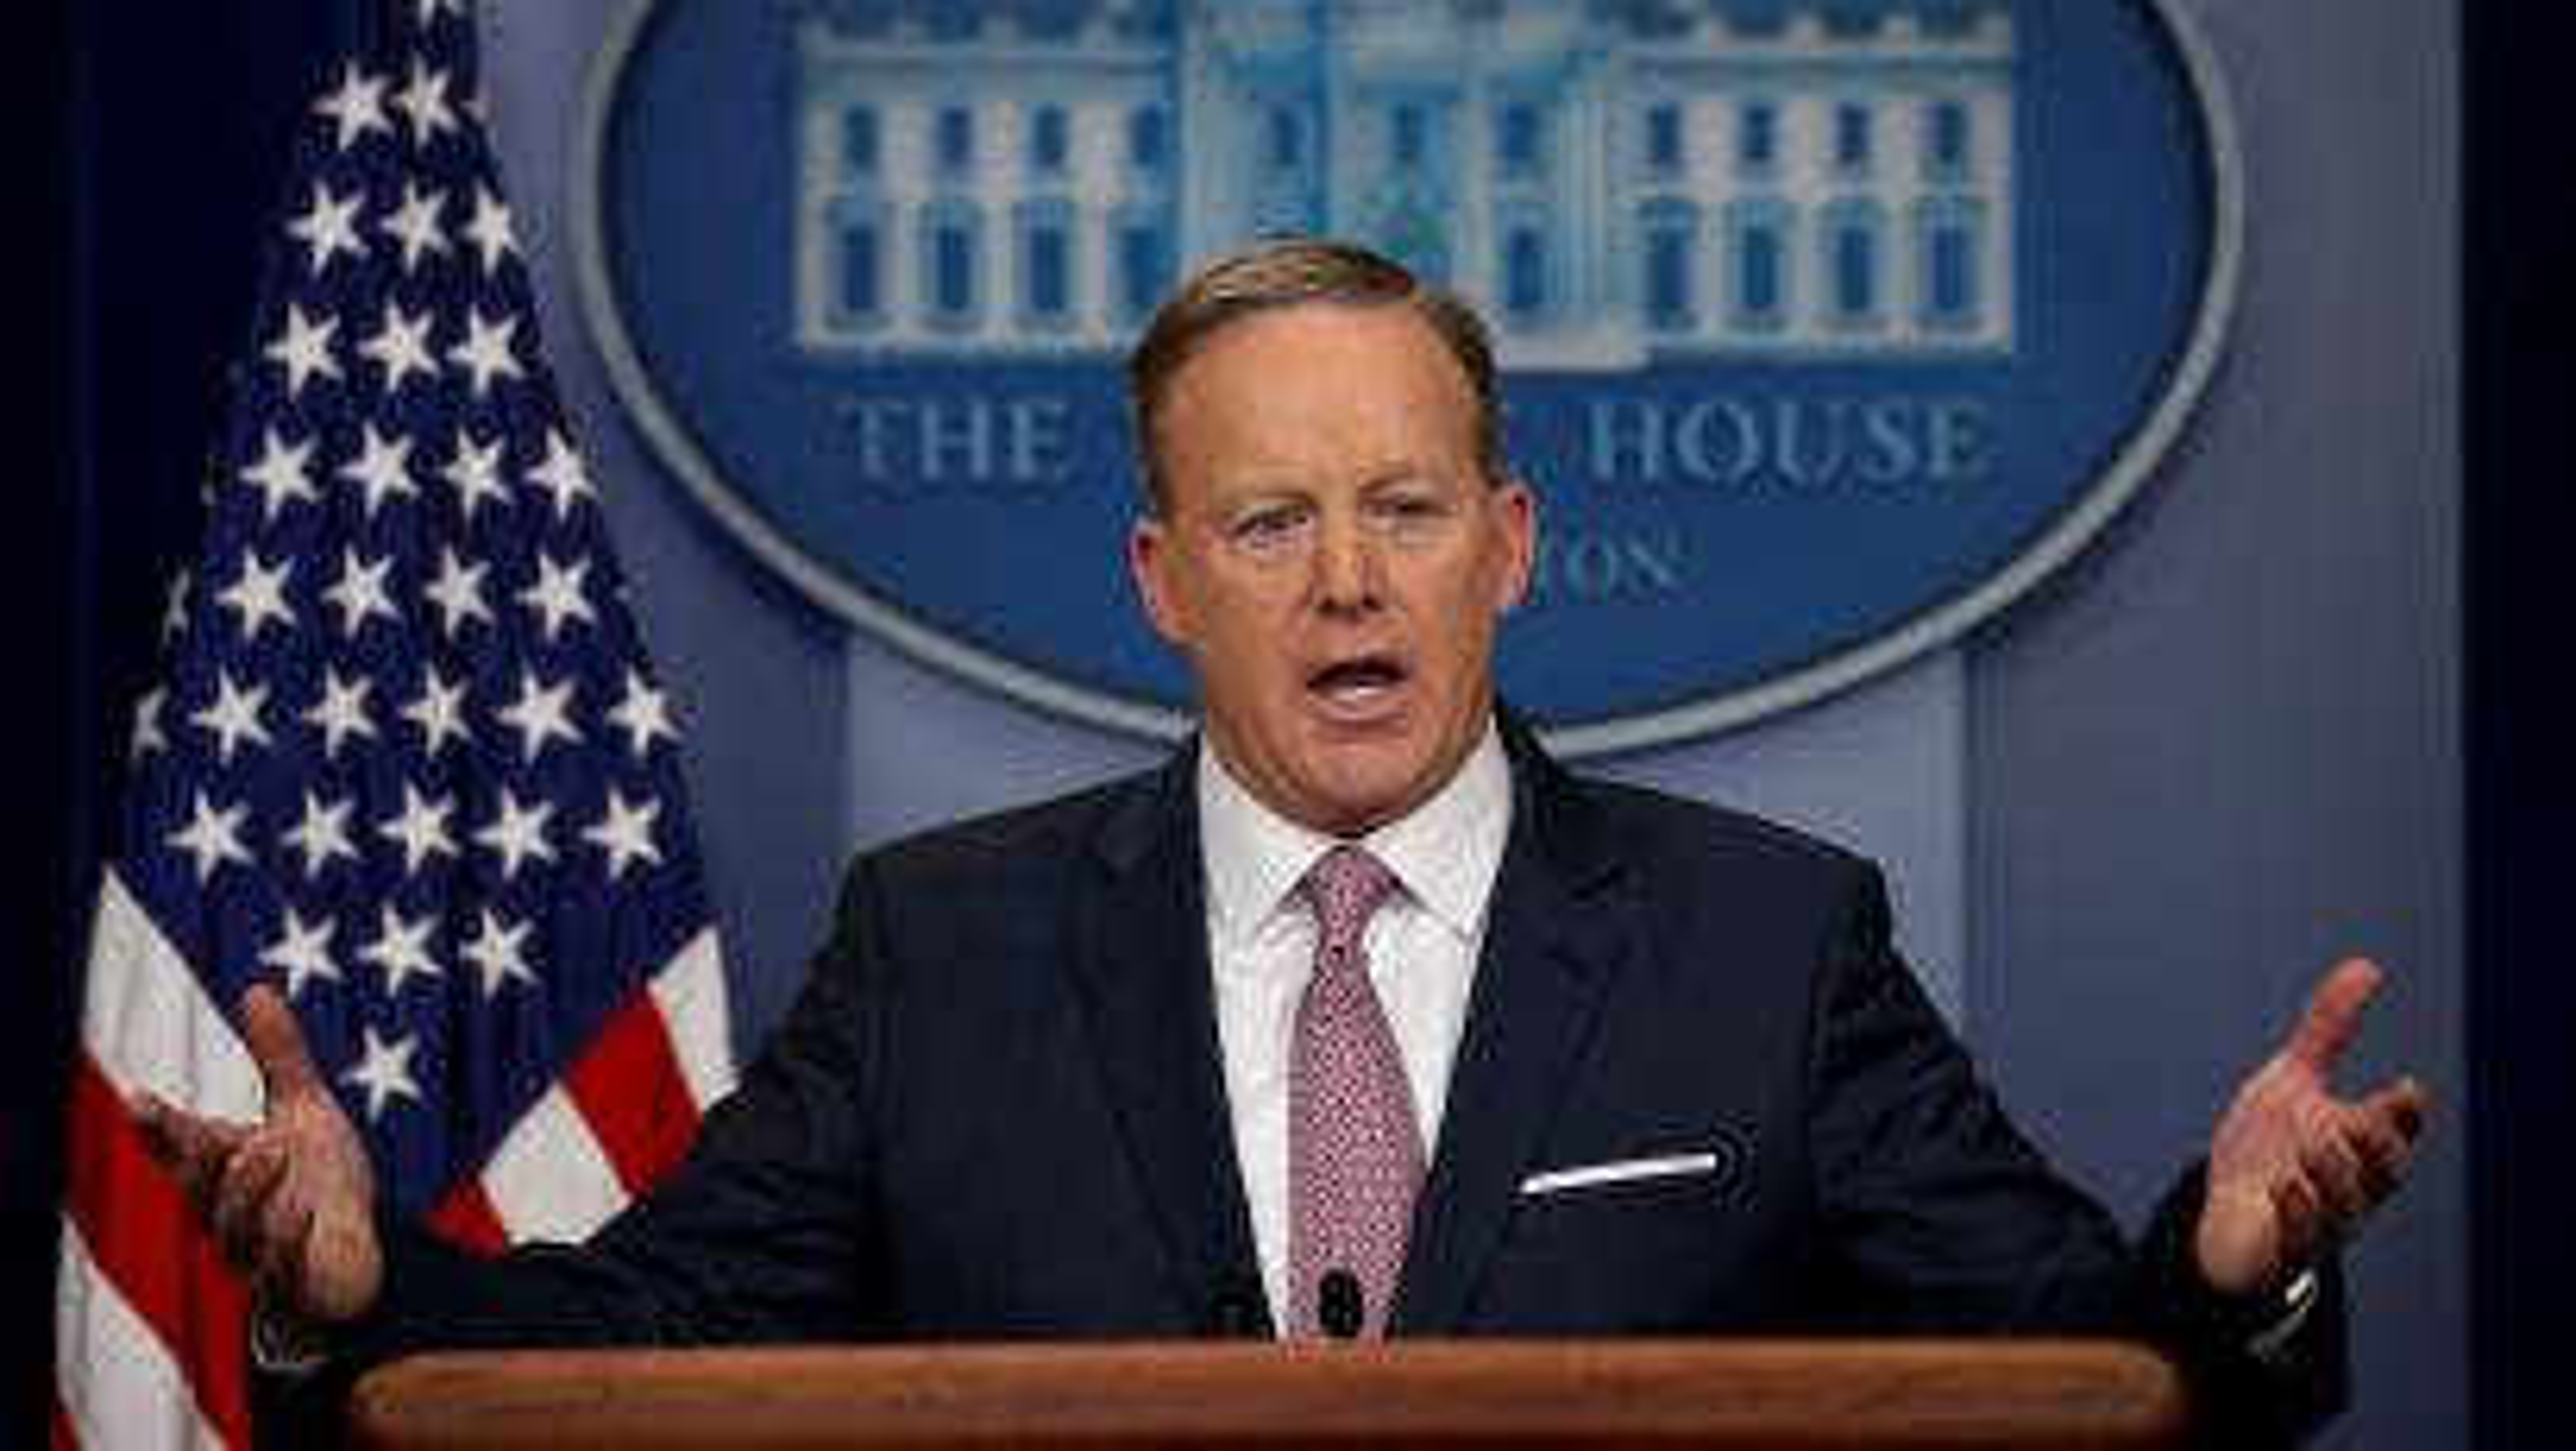 White House Press Secretary Sean Spicer at a podium